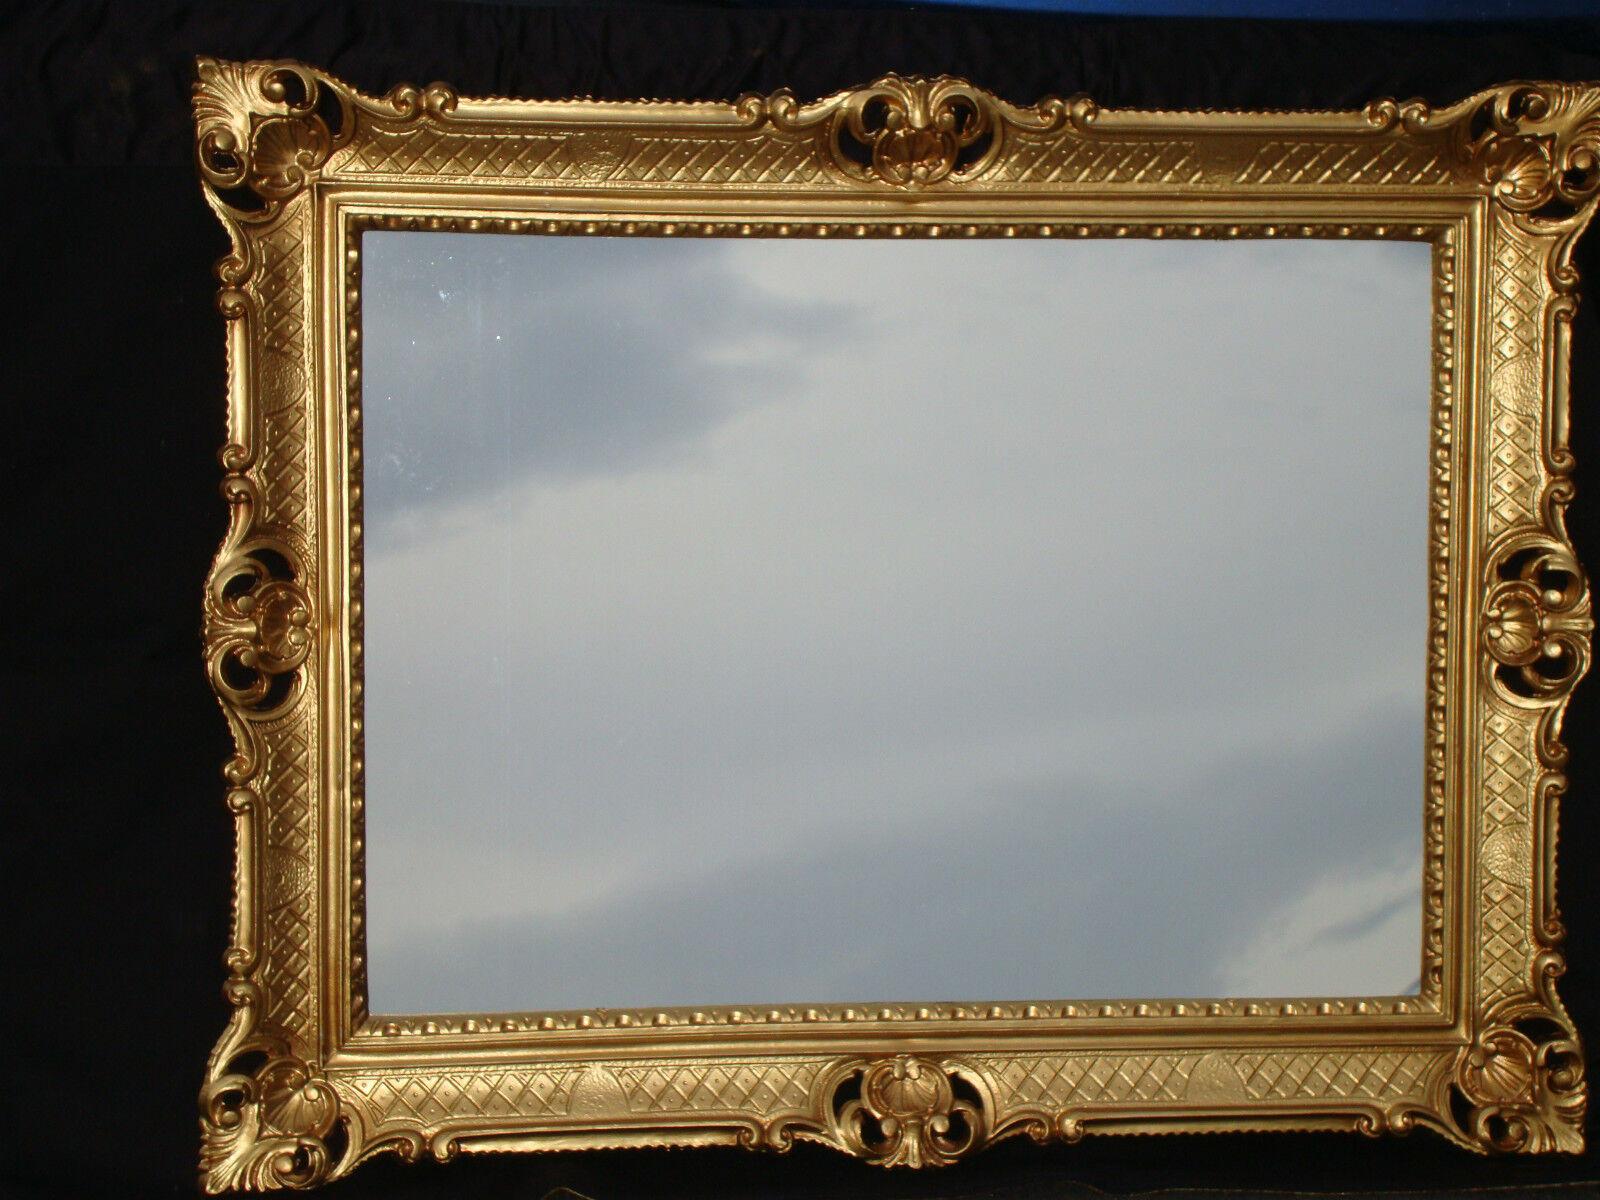 Cadre d'image 90x70 cm mirroir ANCIEN REPRO baroque or rechtkig reg3057-g